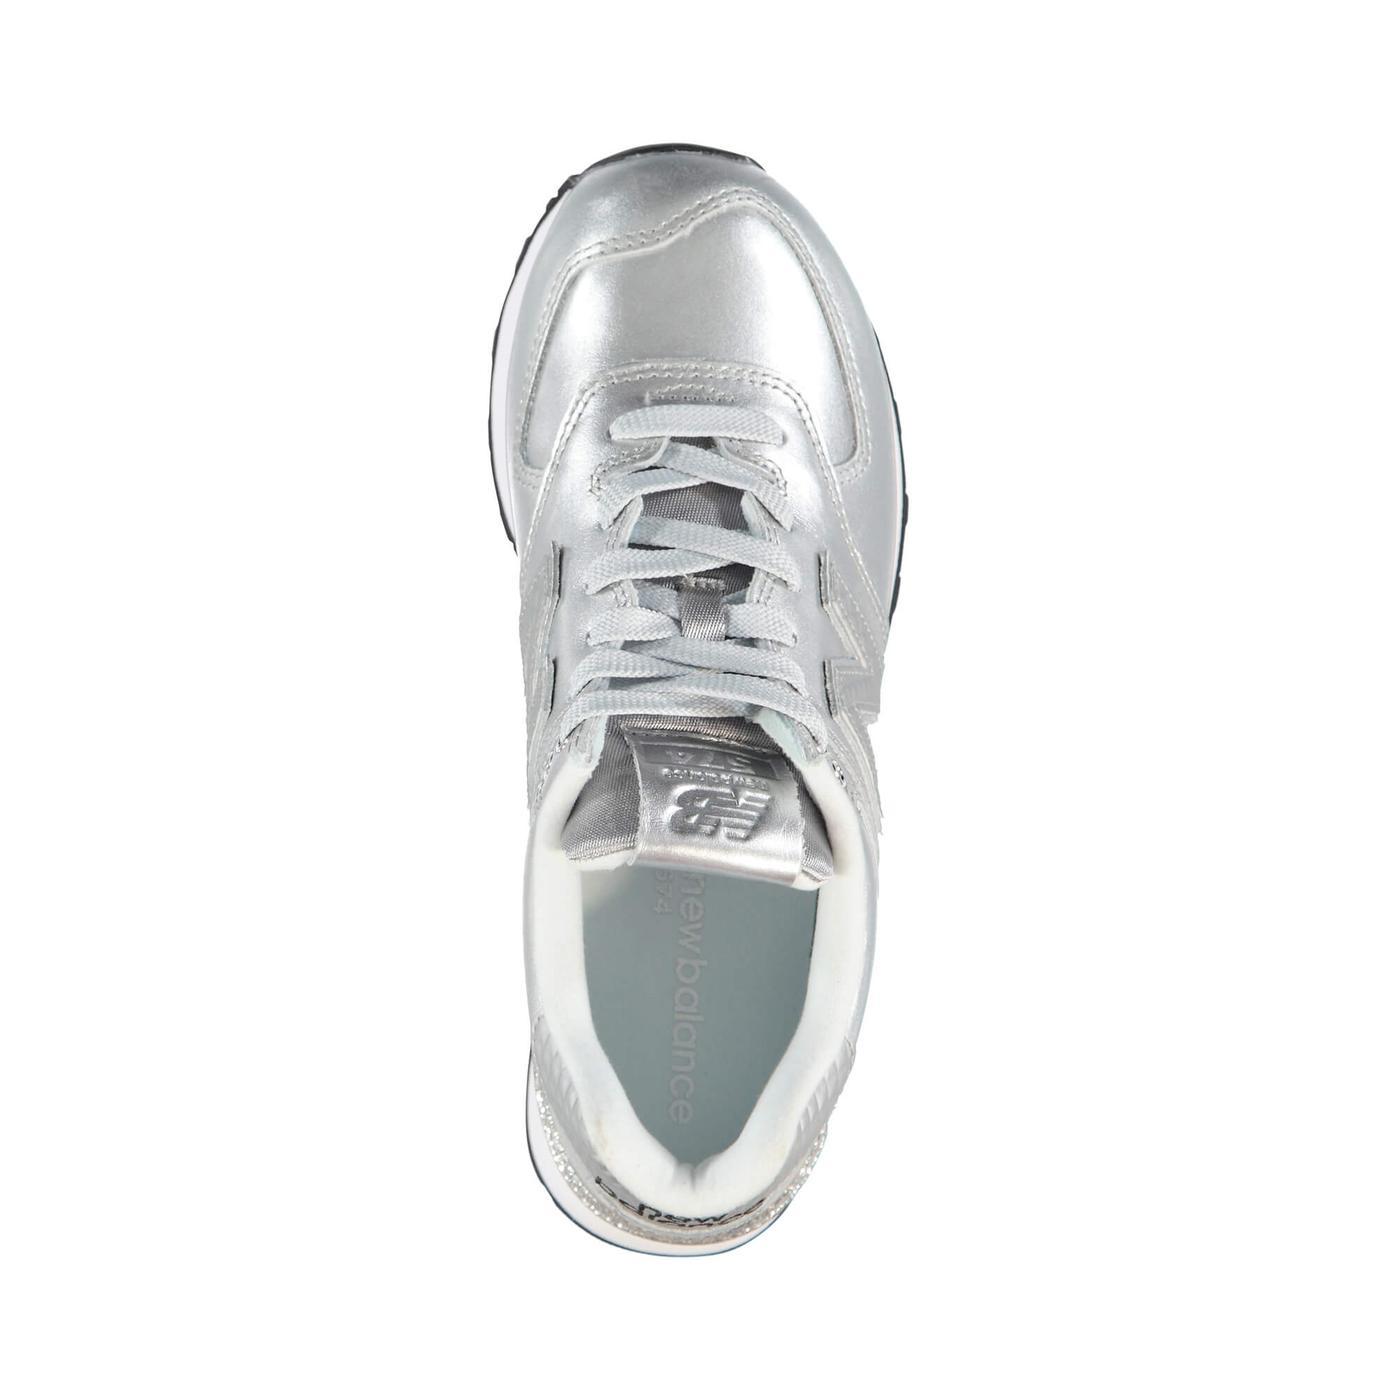 New Balance 576 Glitter Punk Kadın Gümüş Sneaker